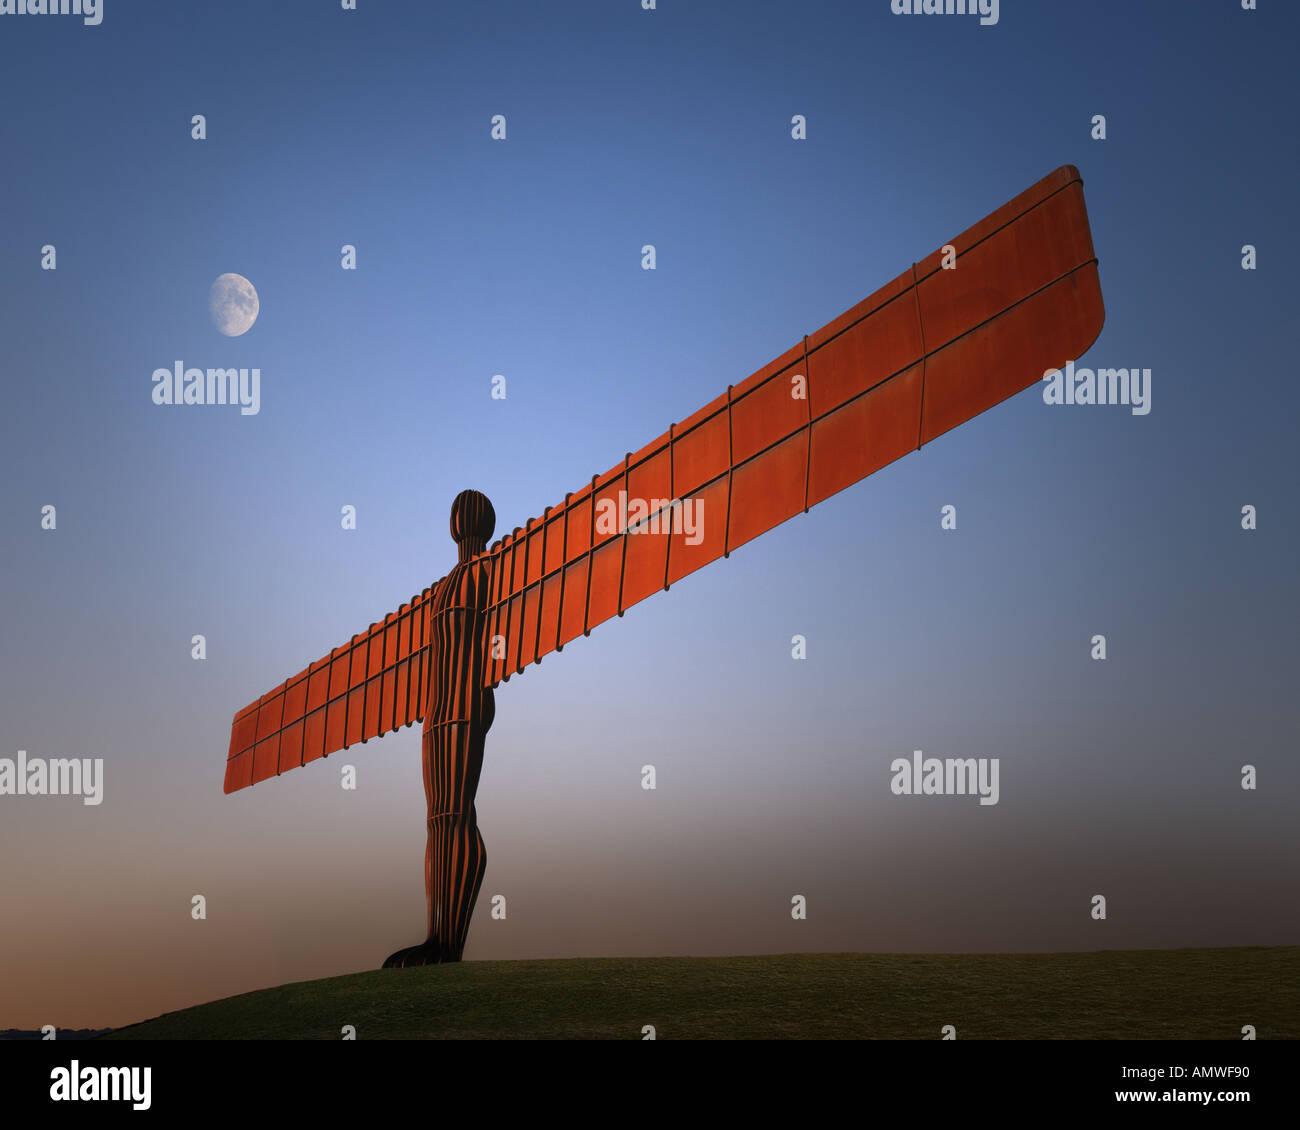 GB - TYNE AND WEAR: Angel of the North near Gateshead - Stock Image